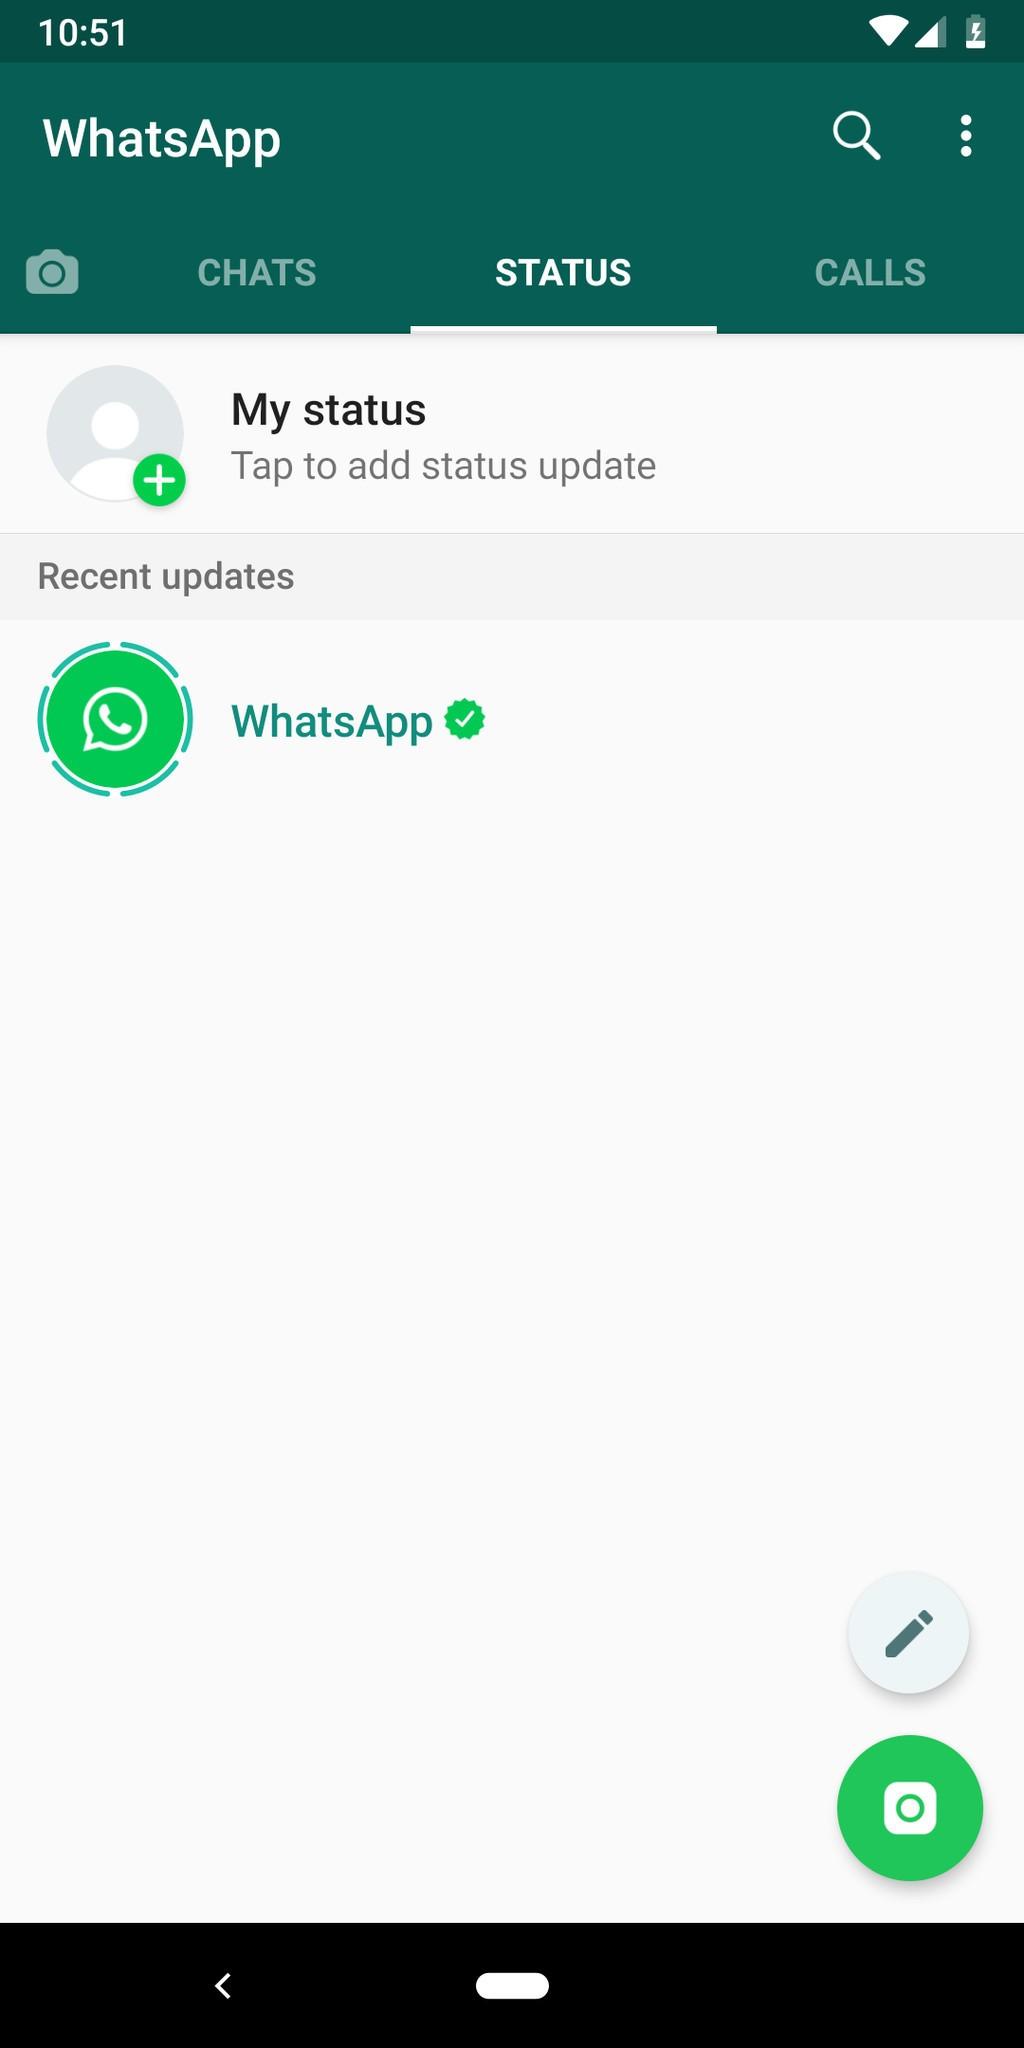 sử dụng Whatsapp cho điện thoại Android